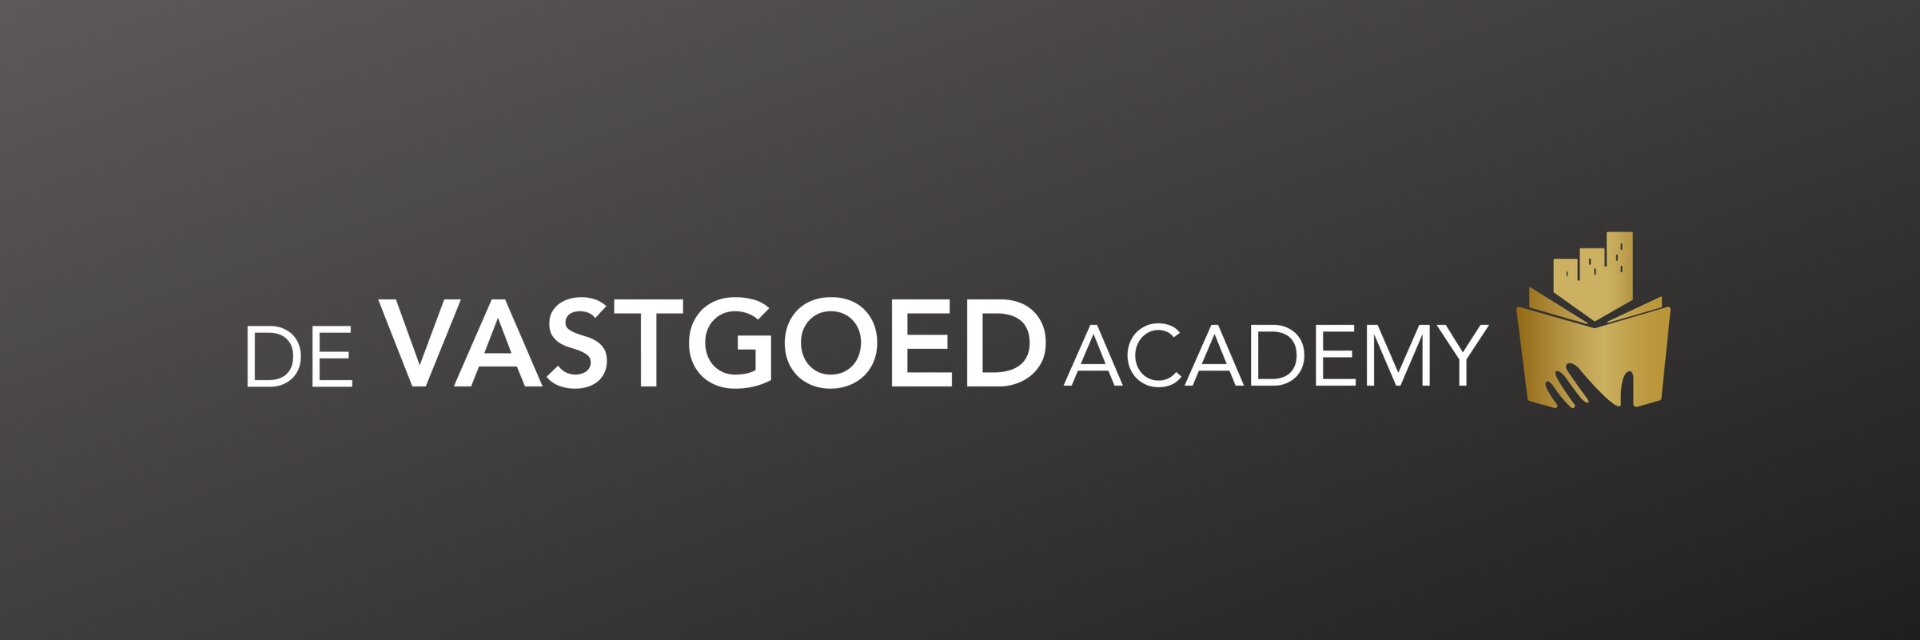 vastgoed academy review